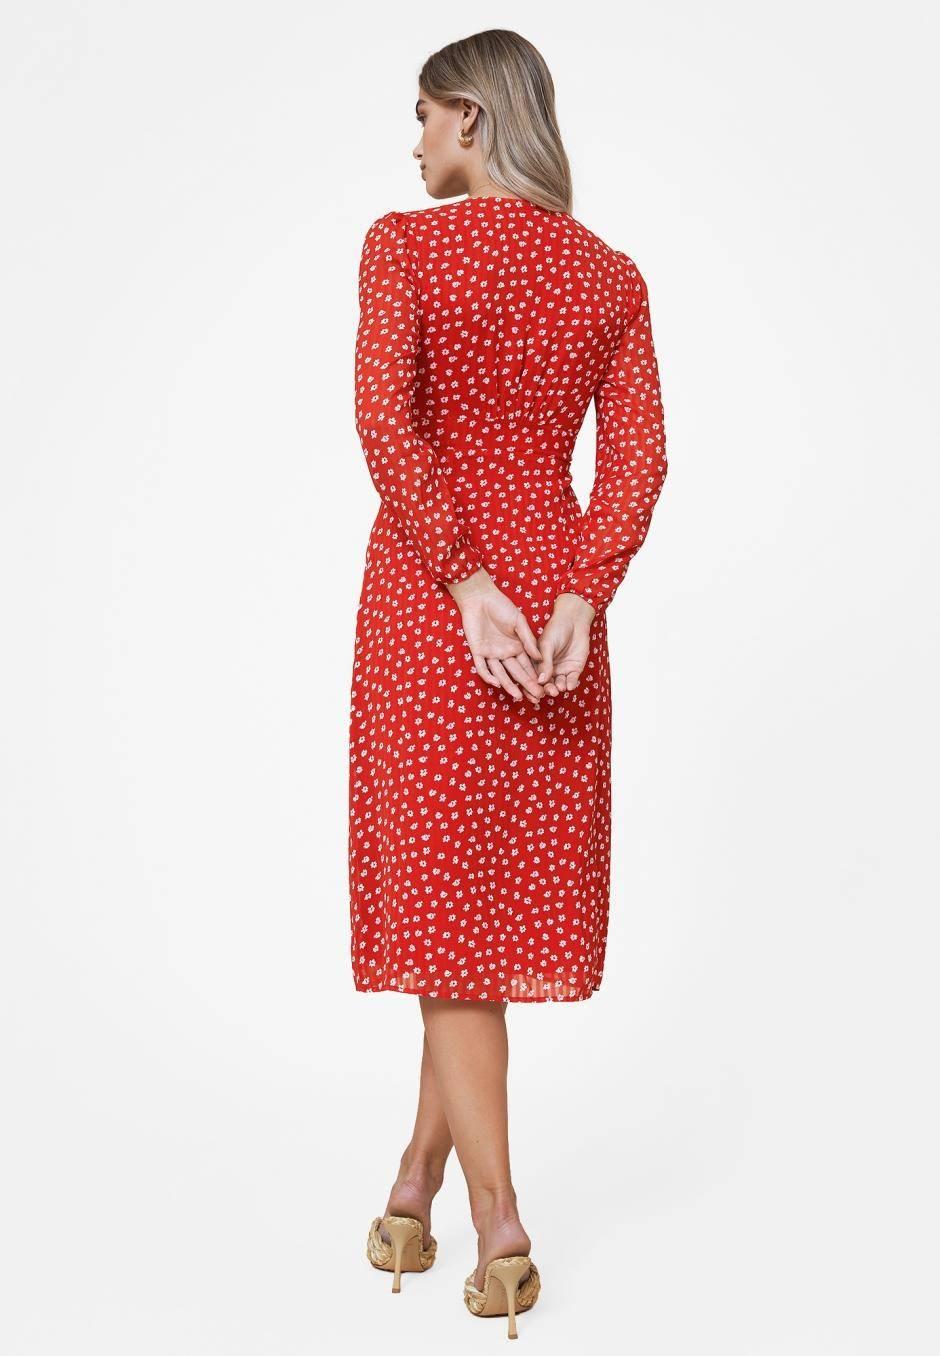 Adoore Paris Dress Red